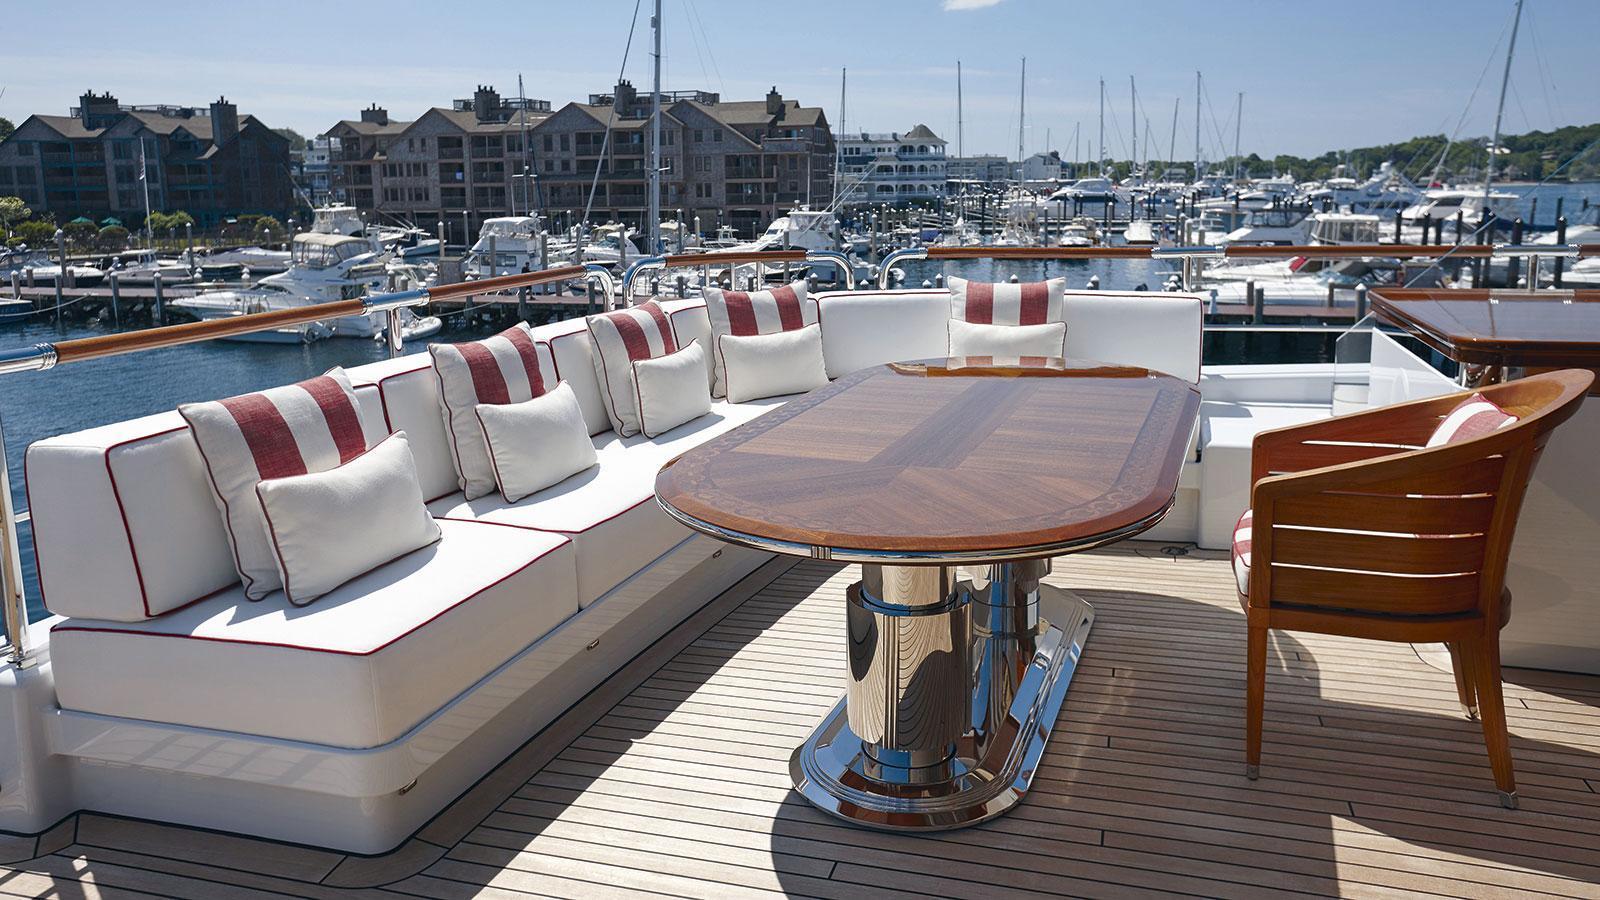 rock-it-motor-yacht-feadship-2014-60m-bridge-deck-aft